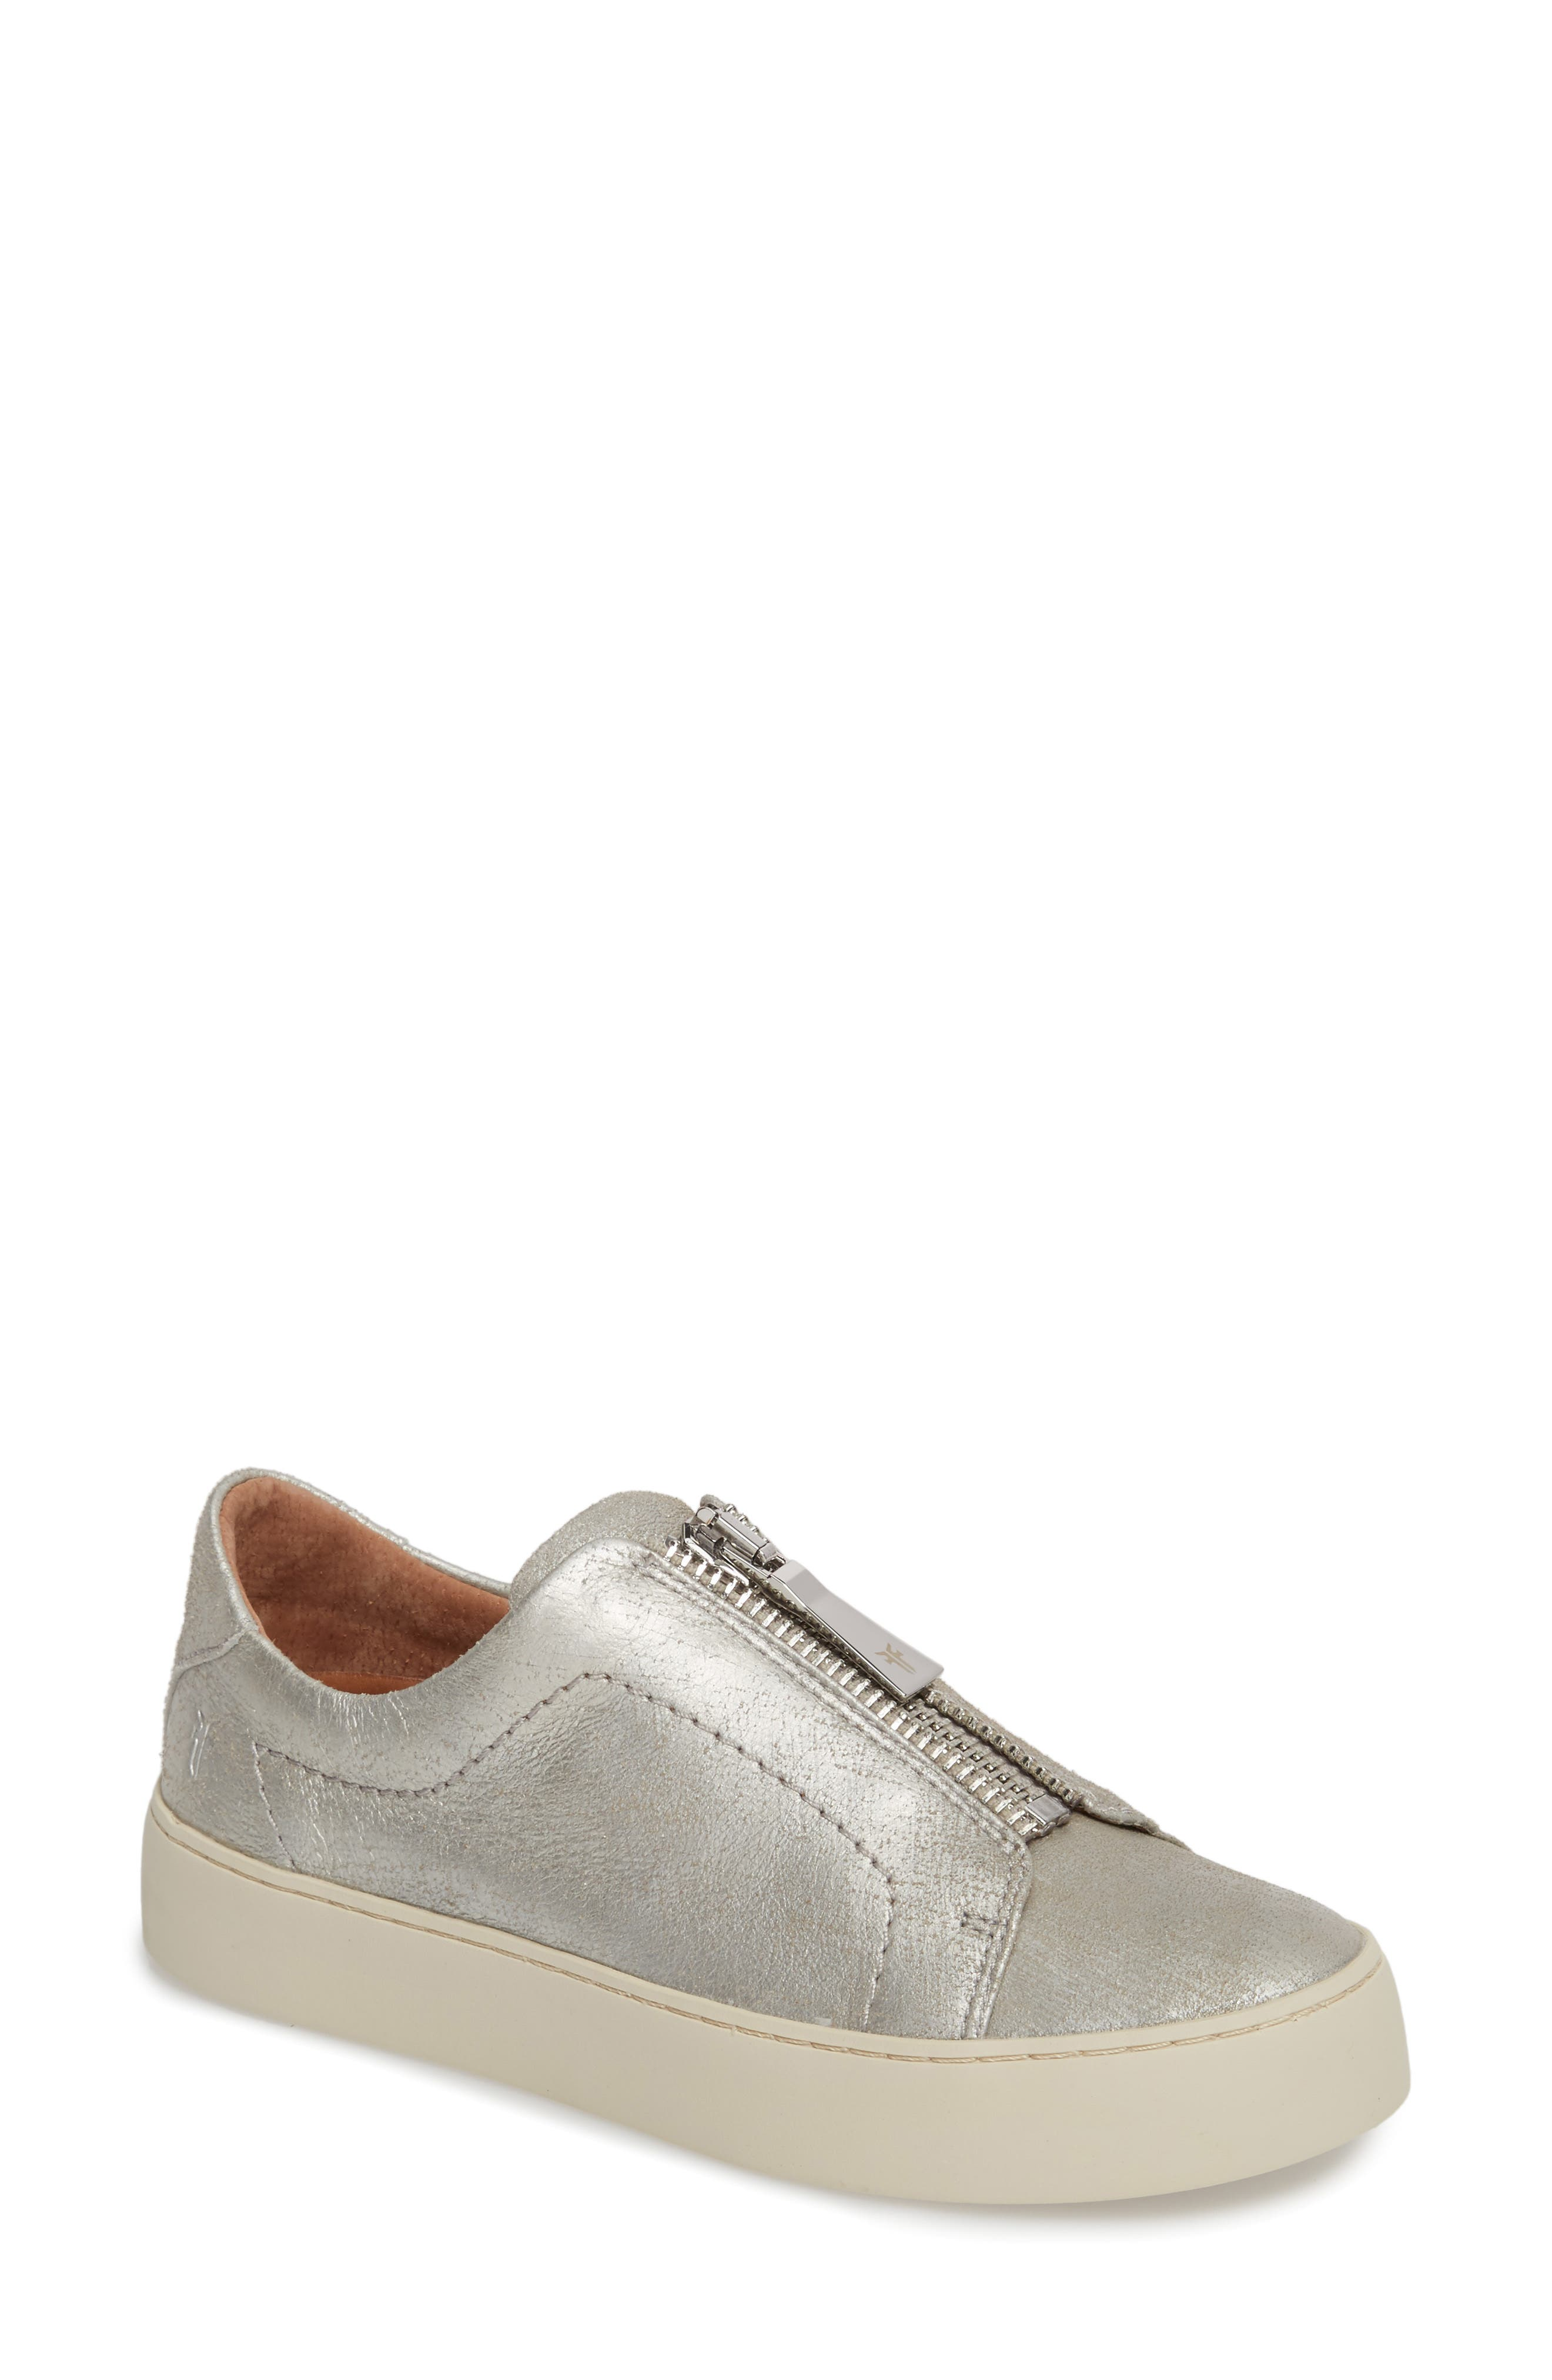 Lena Zip Sneaker,                             Main thumbnail 1, color,                             Silver Leather